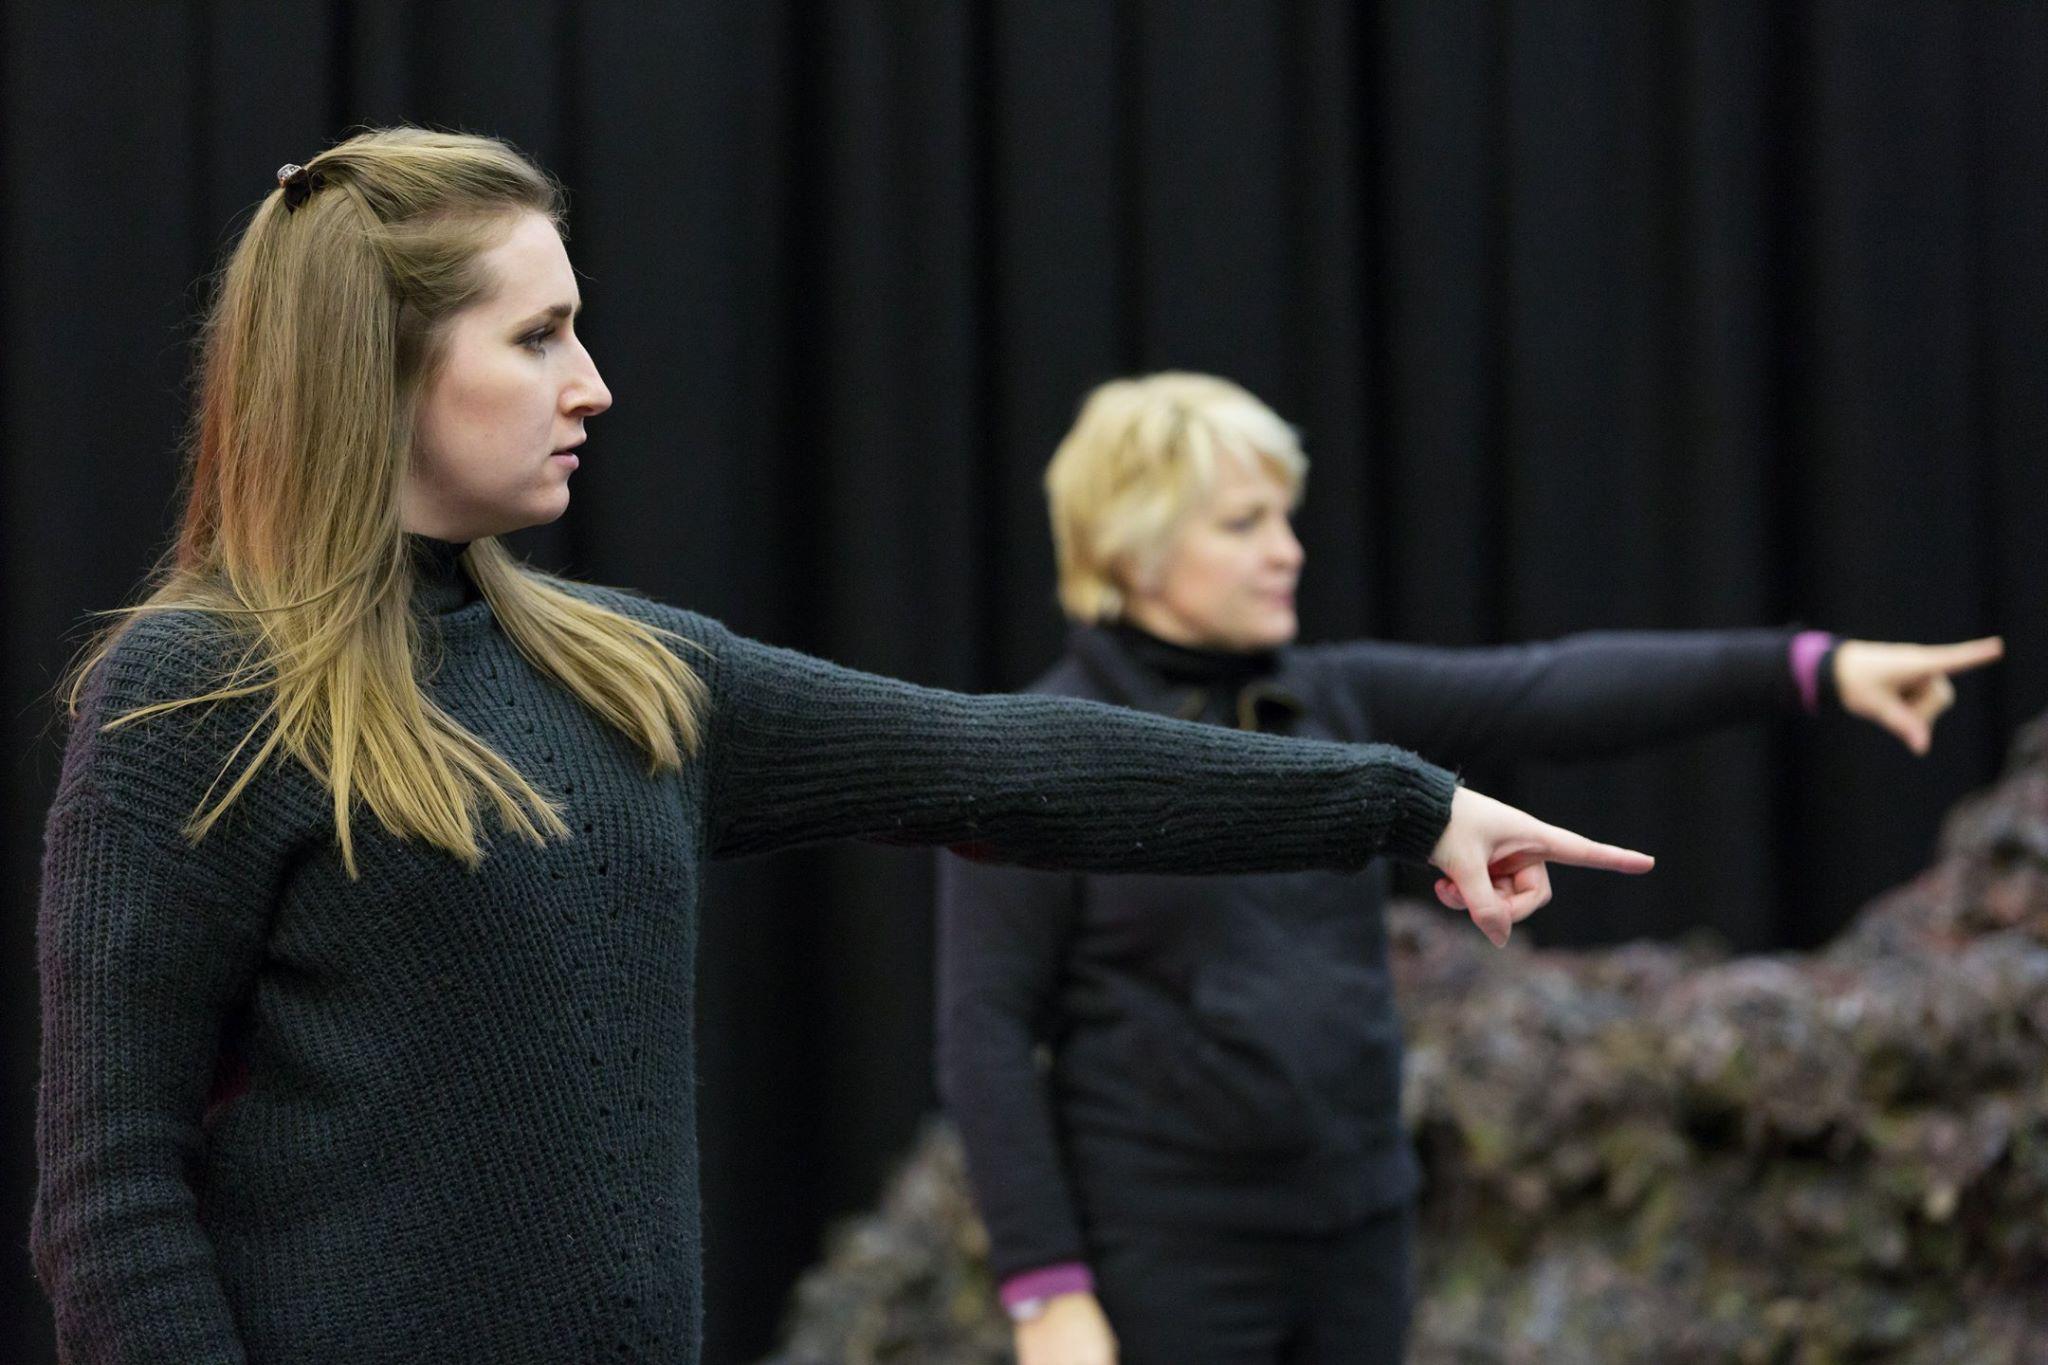 The Monstrous Child - Elizabeth Karani rehearsing at the Royal Opera House